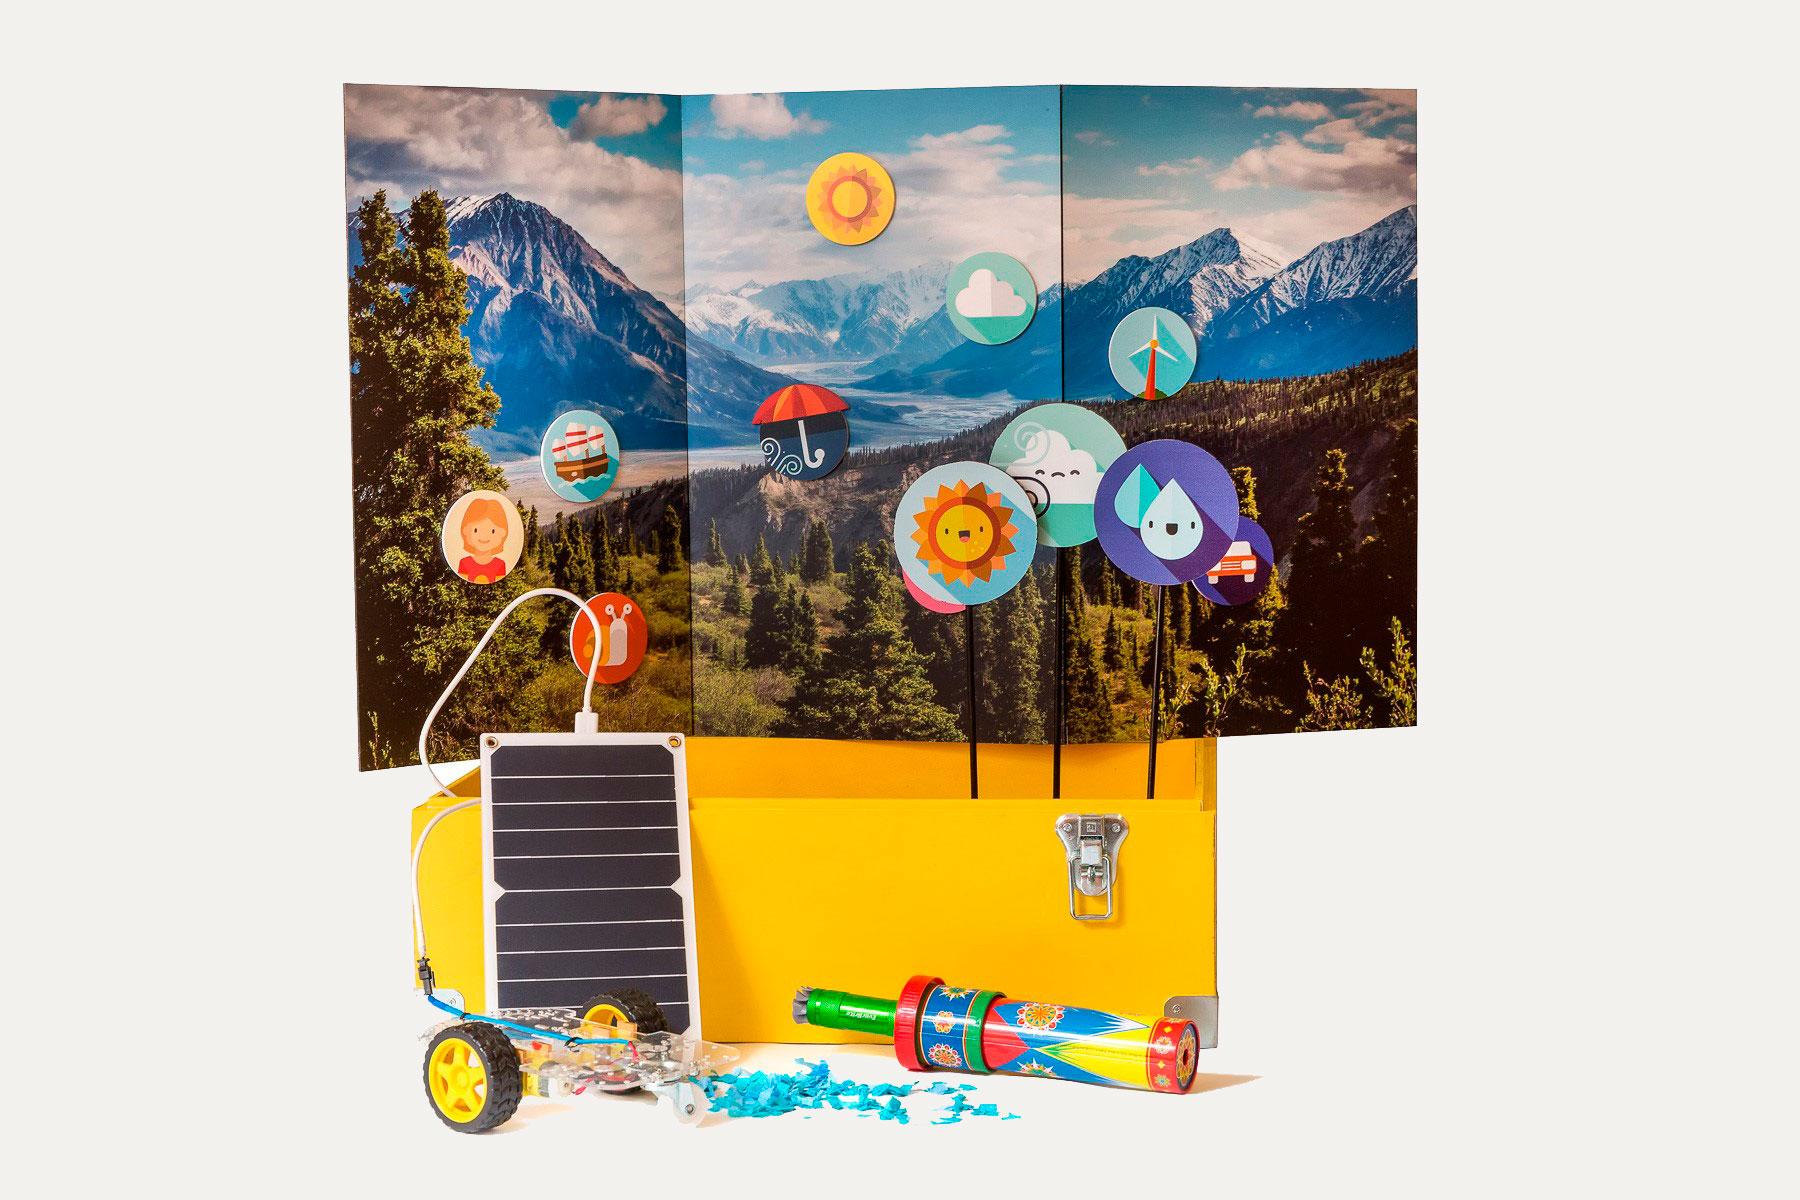 magia-energia-maleta-amarilla